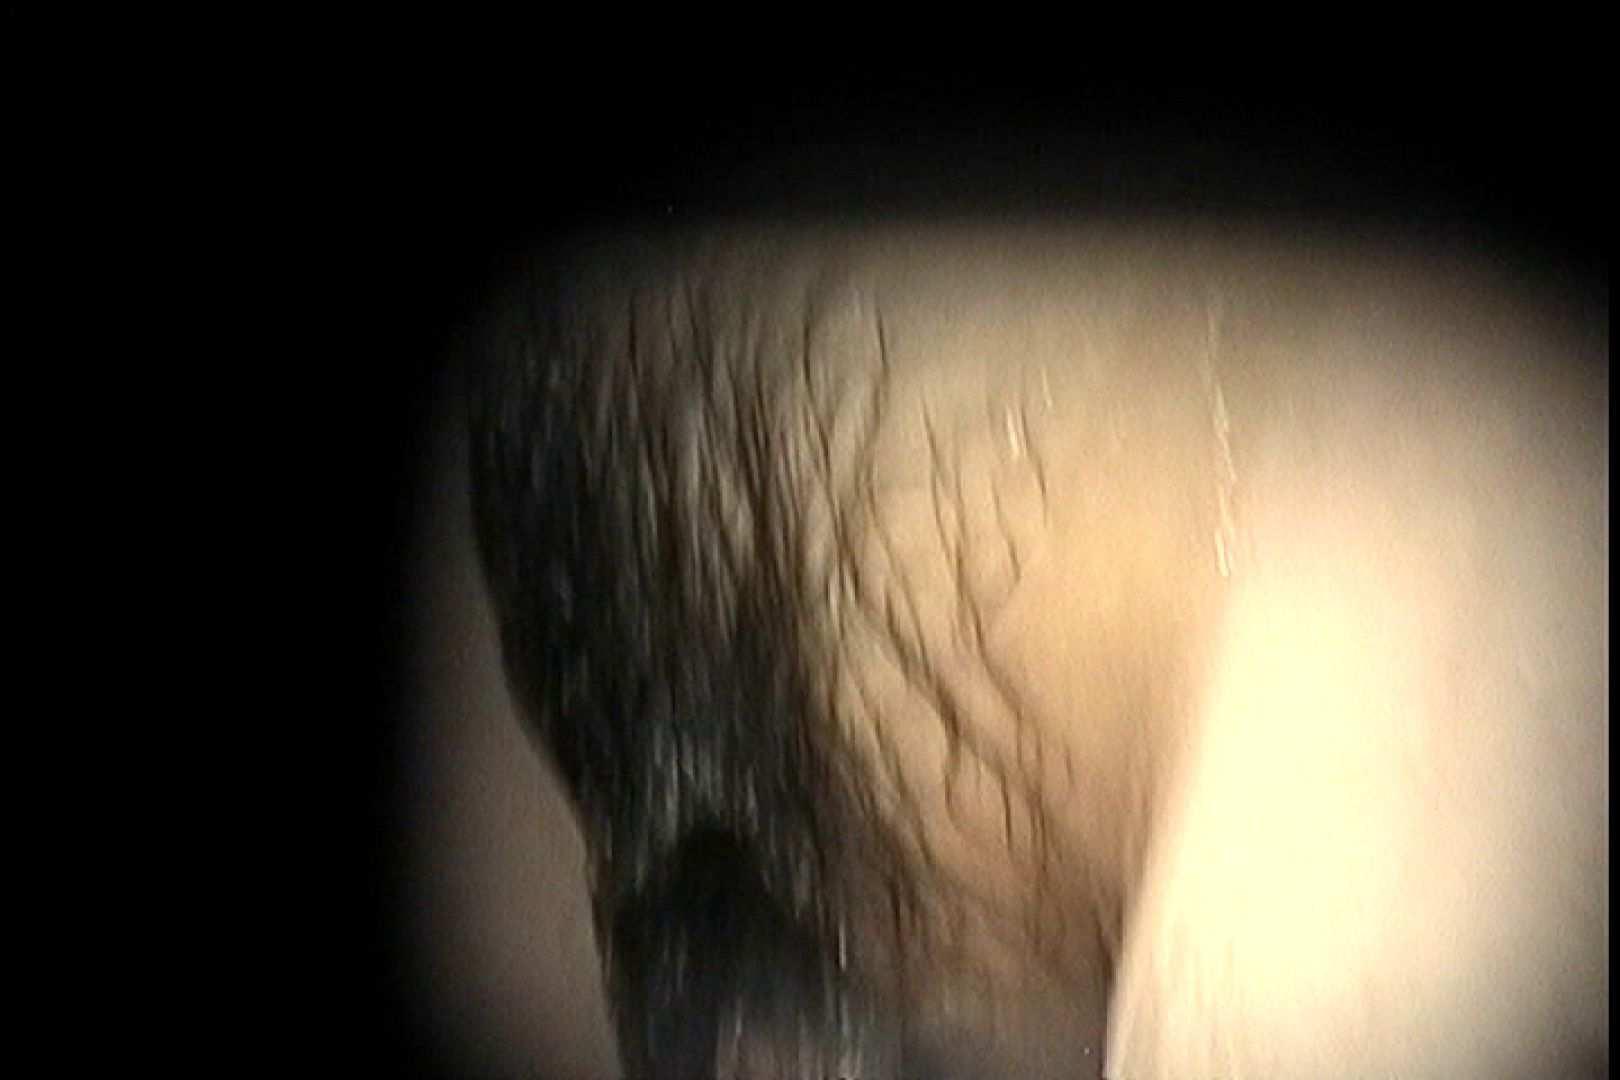 No.41 陰茎から滴り落ちる水滴 接写 オマンコ無修正動画無料 107枚 74